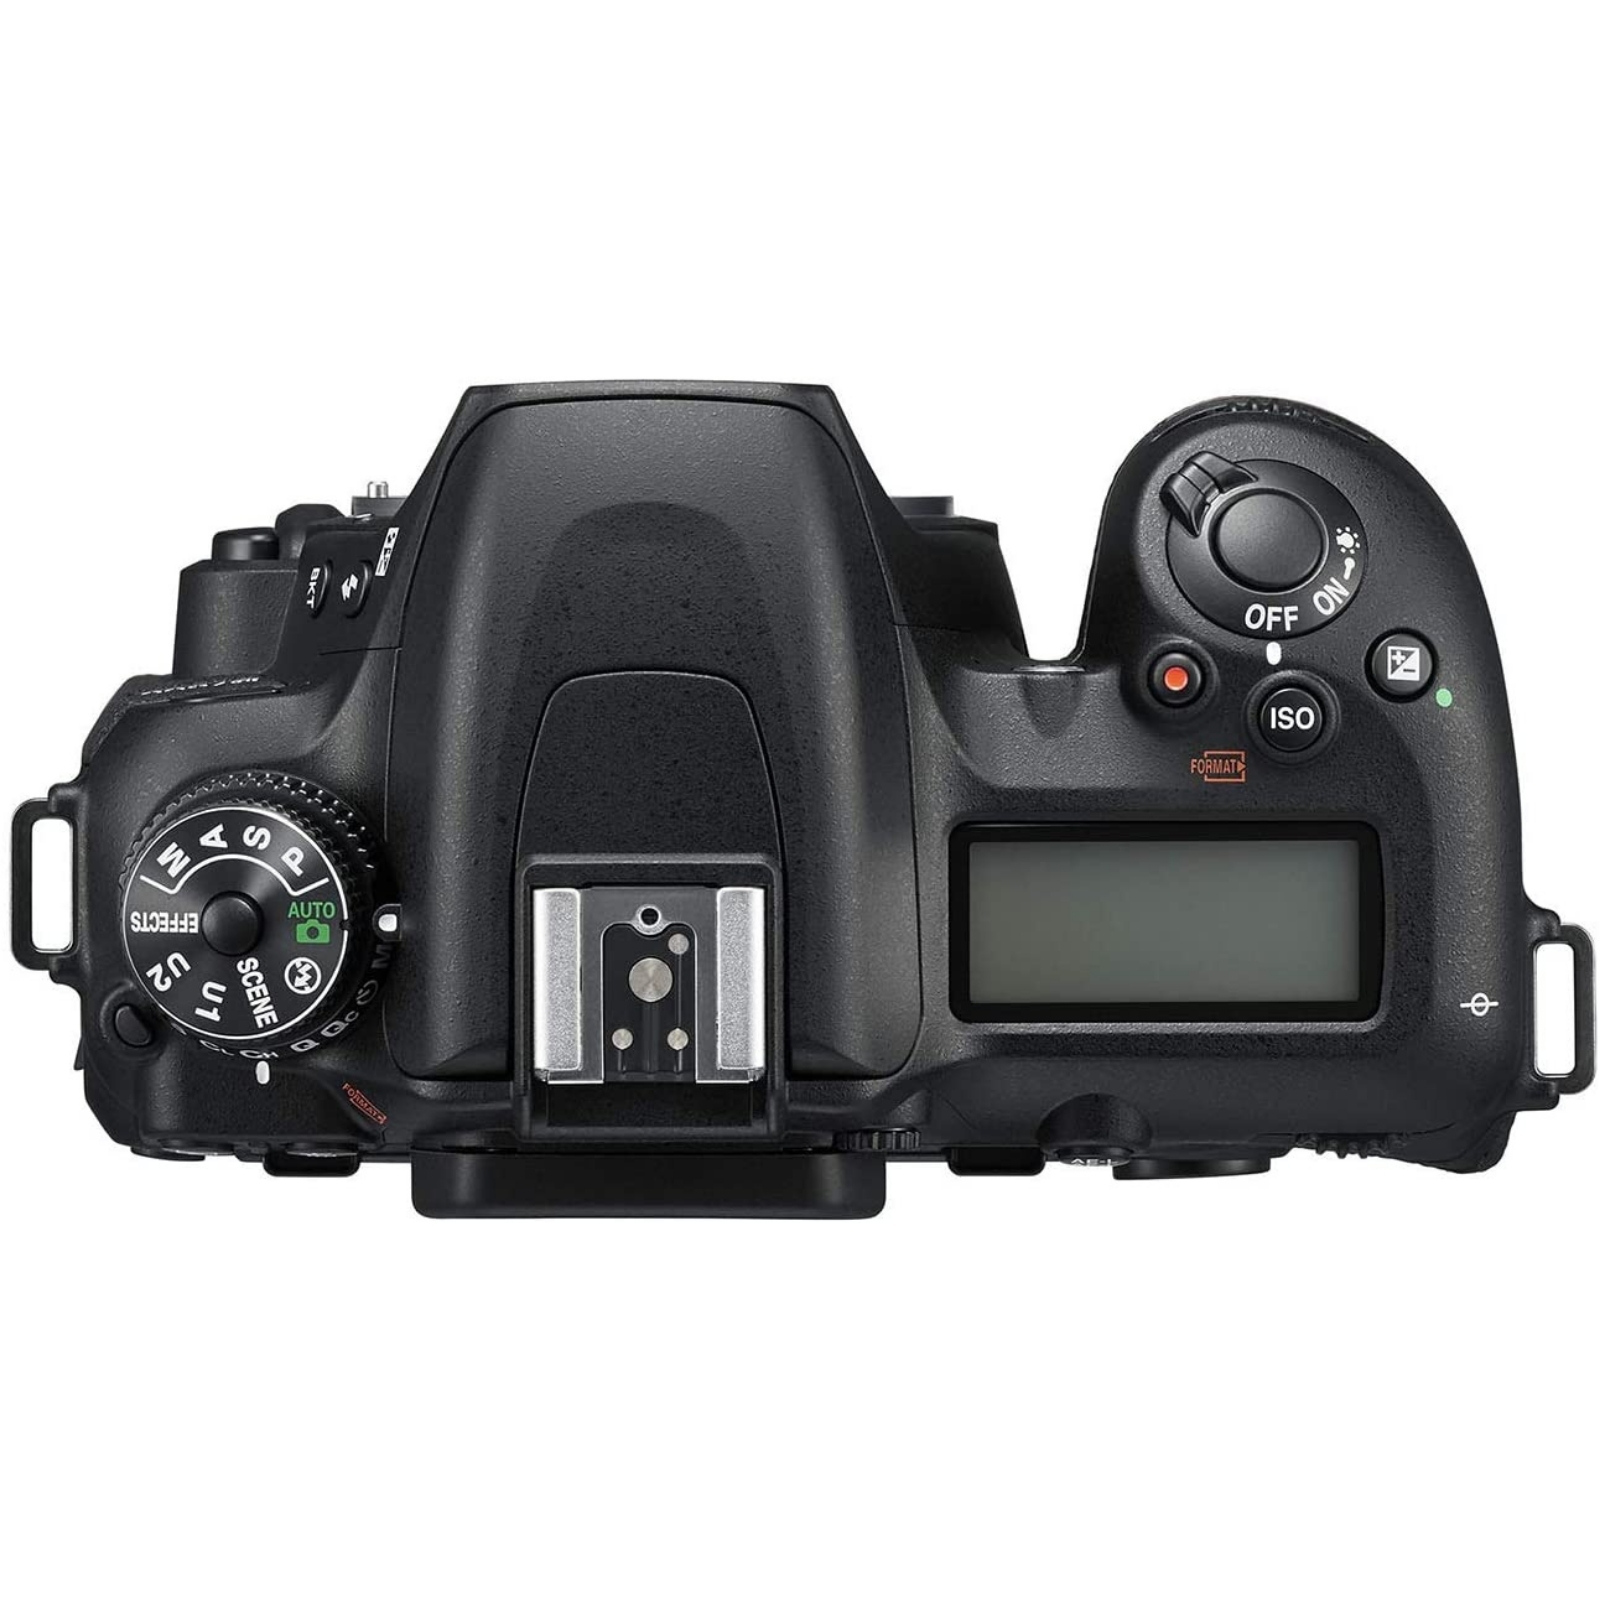 Nikon ニコン デジタル一眼レフカメラ D7500 ボディ ブラック 新品